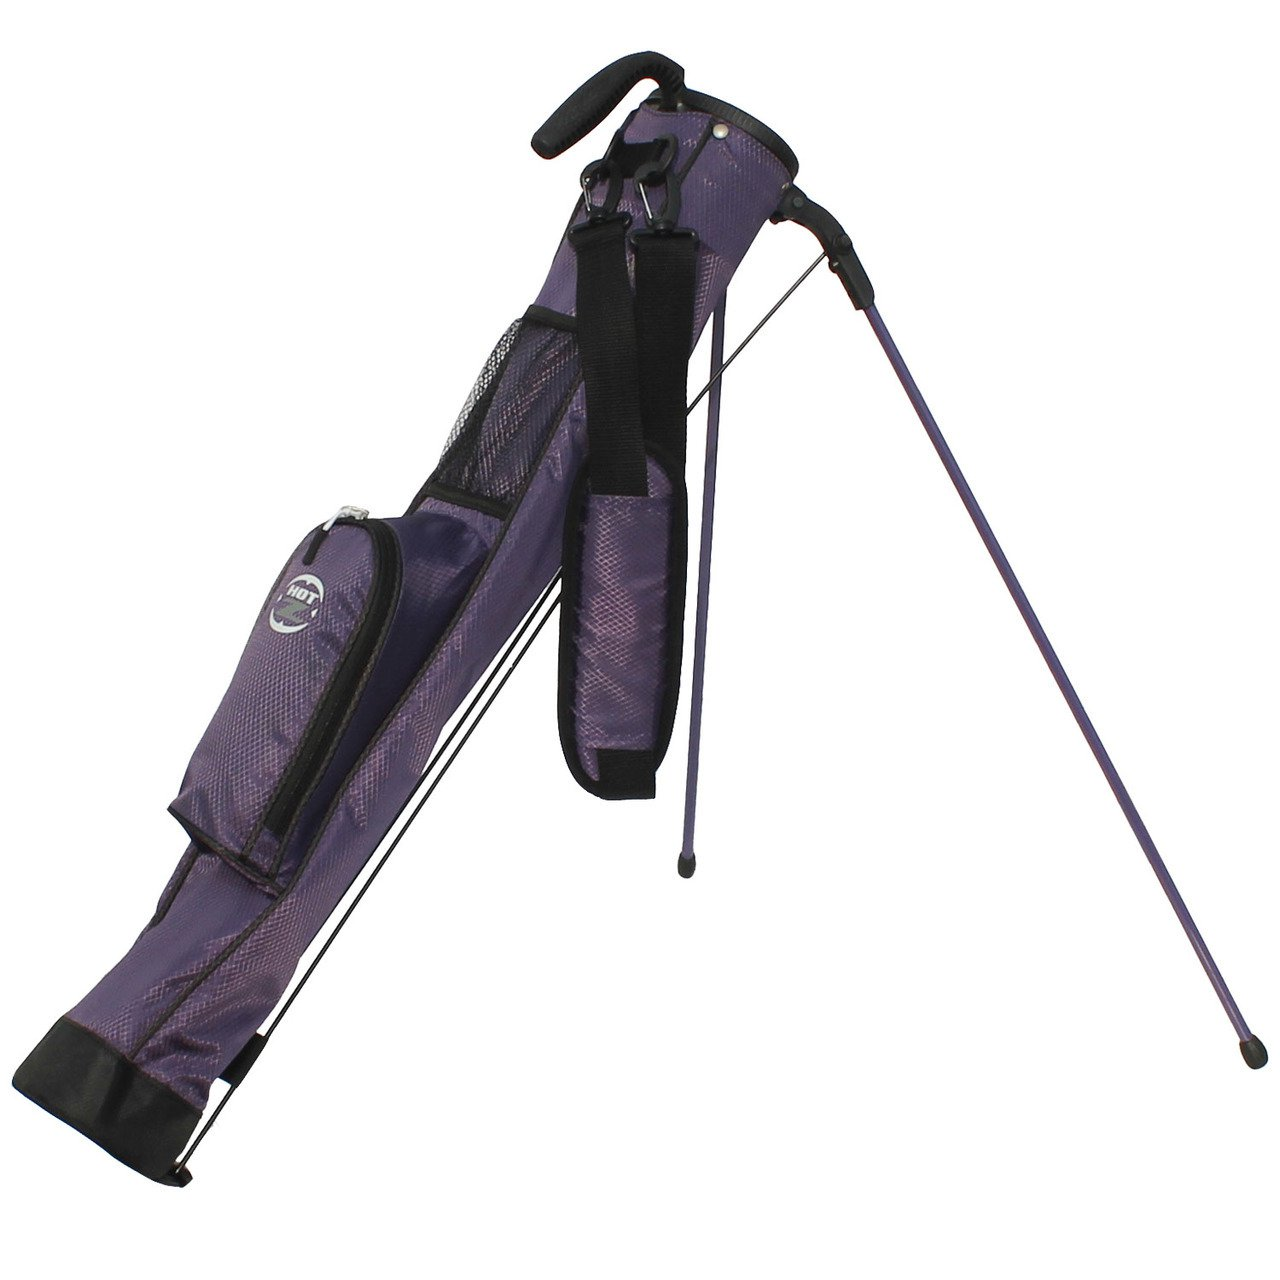 Hot-Z 1.0 Stand Bag Purple Golf Bag